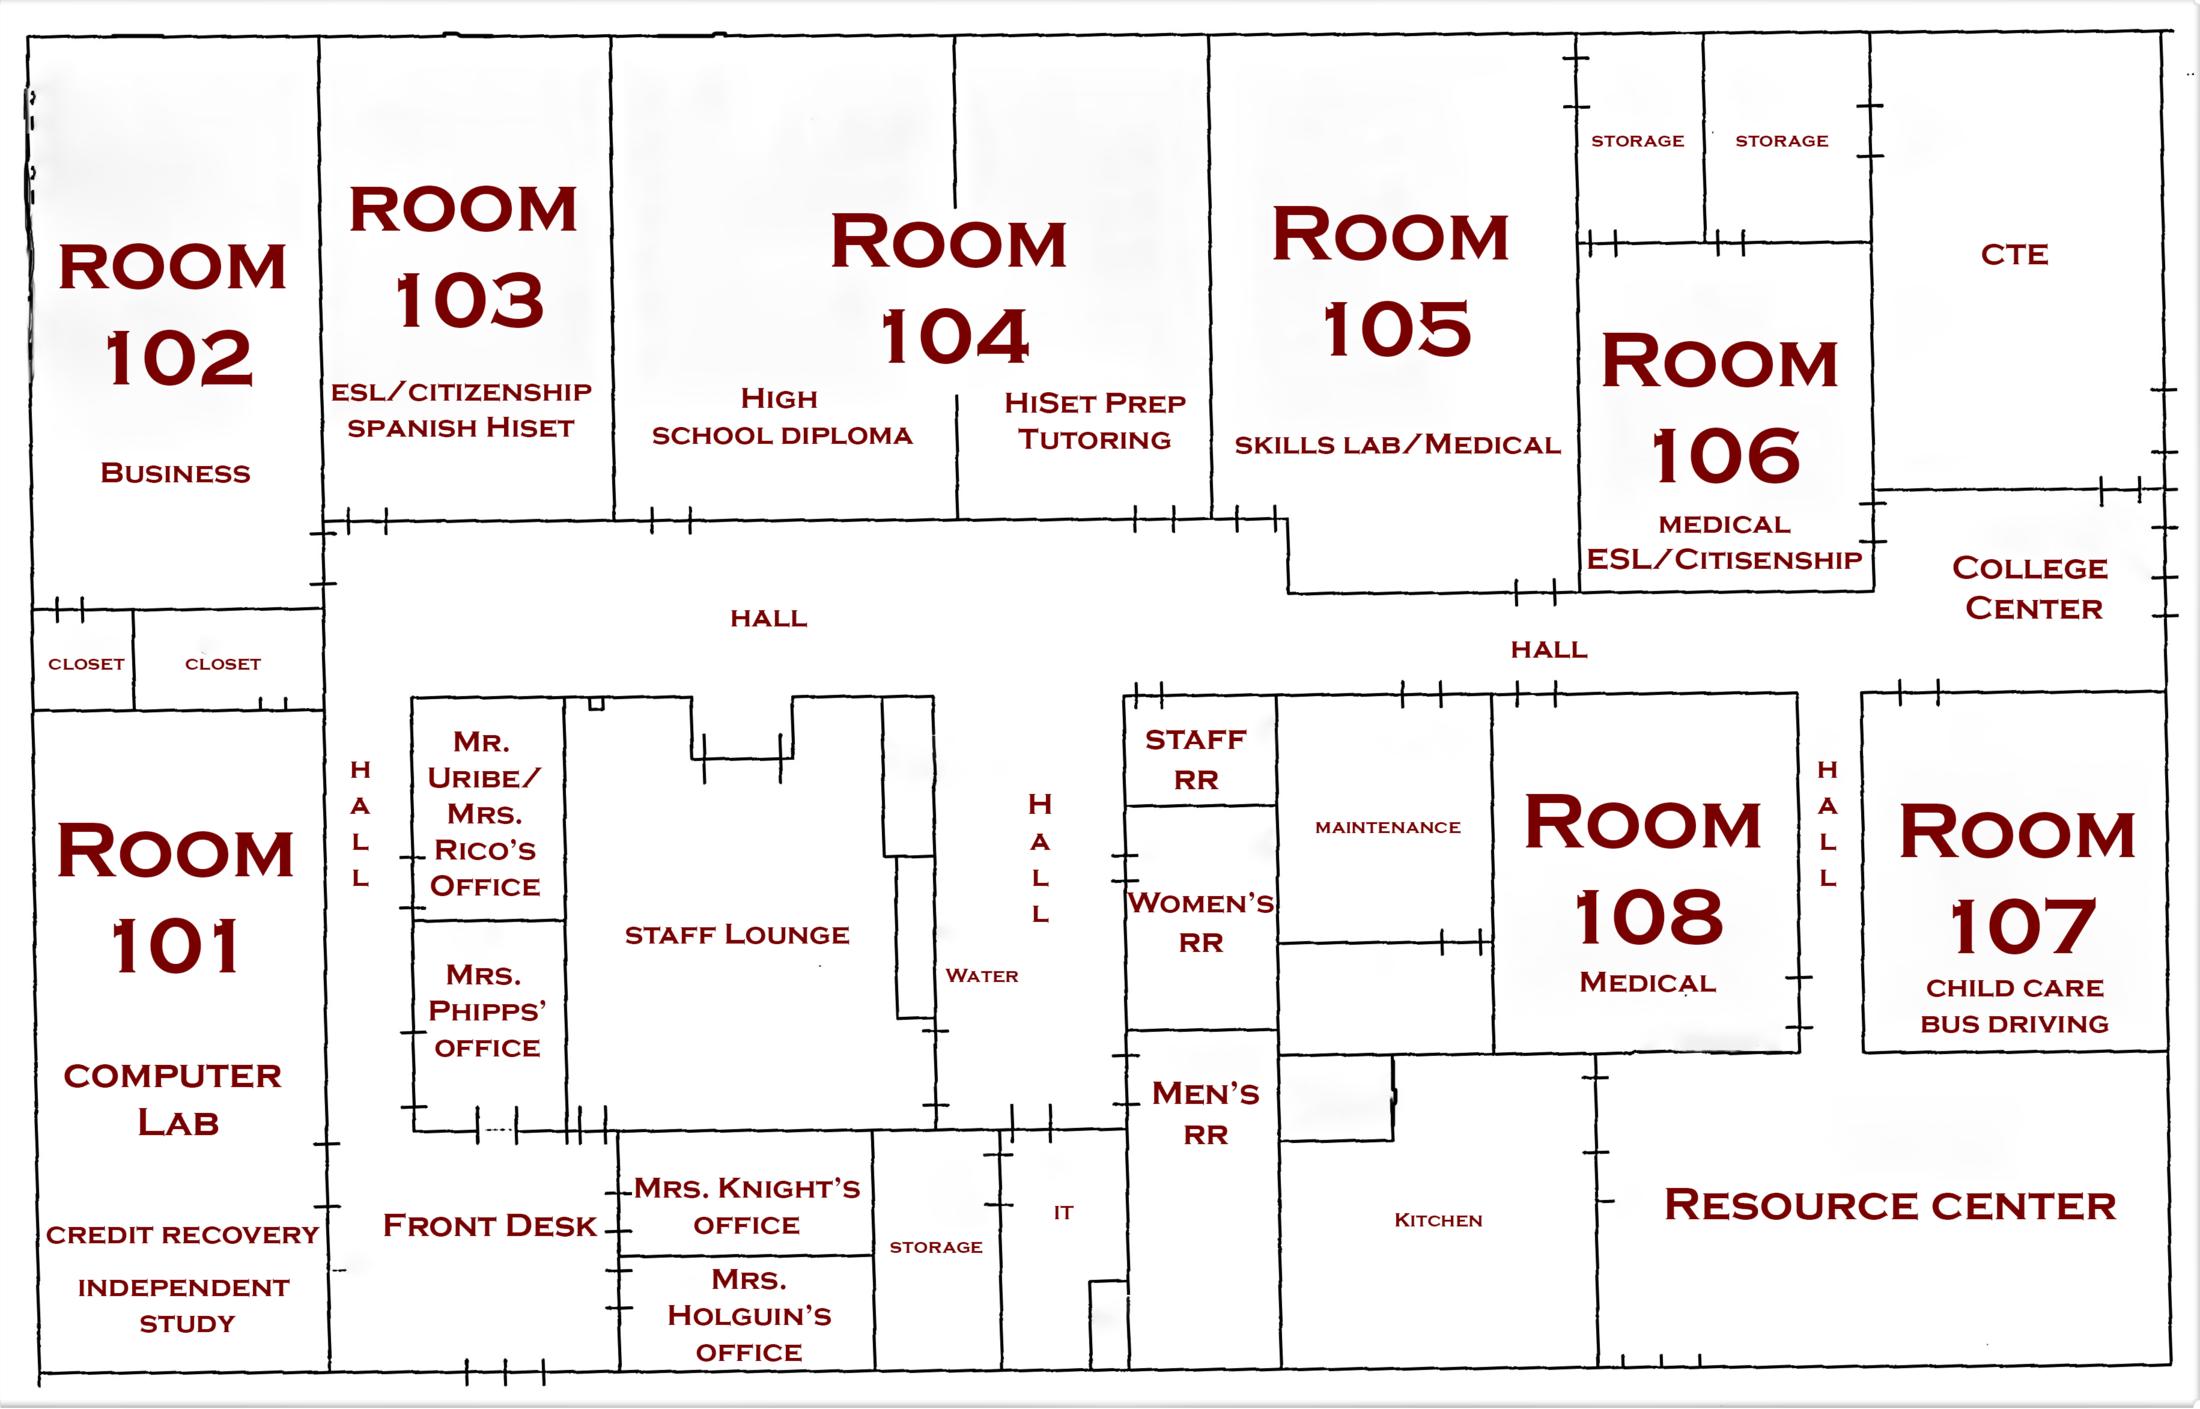 PAS Campus Map – Contact – Porterville Adult School